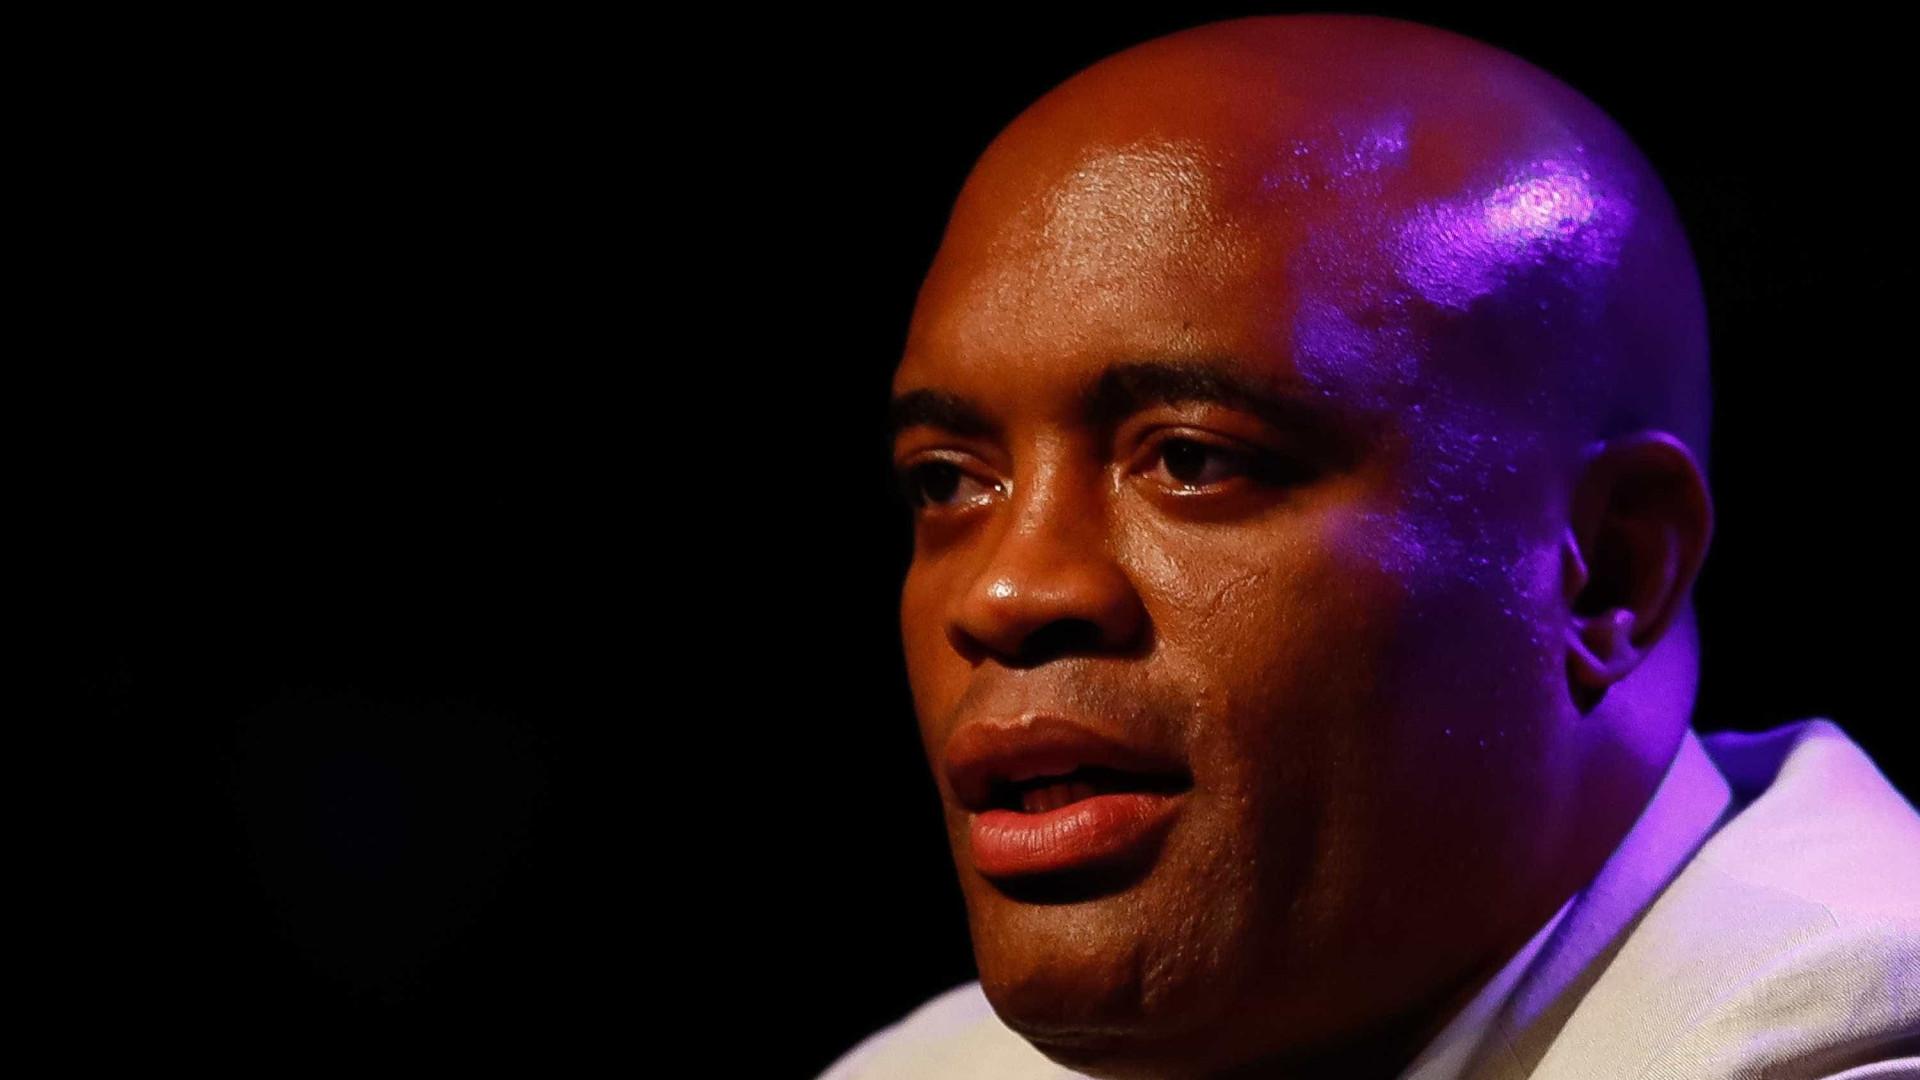 Anderson Silva confirma saída do MMA e já tem luta de boxe agendada